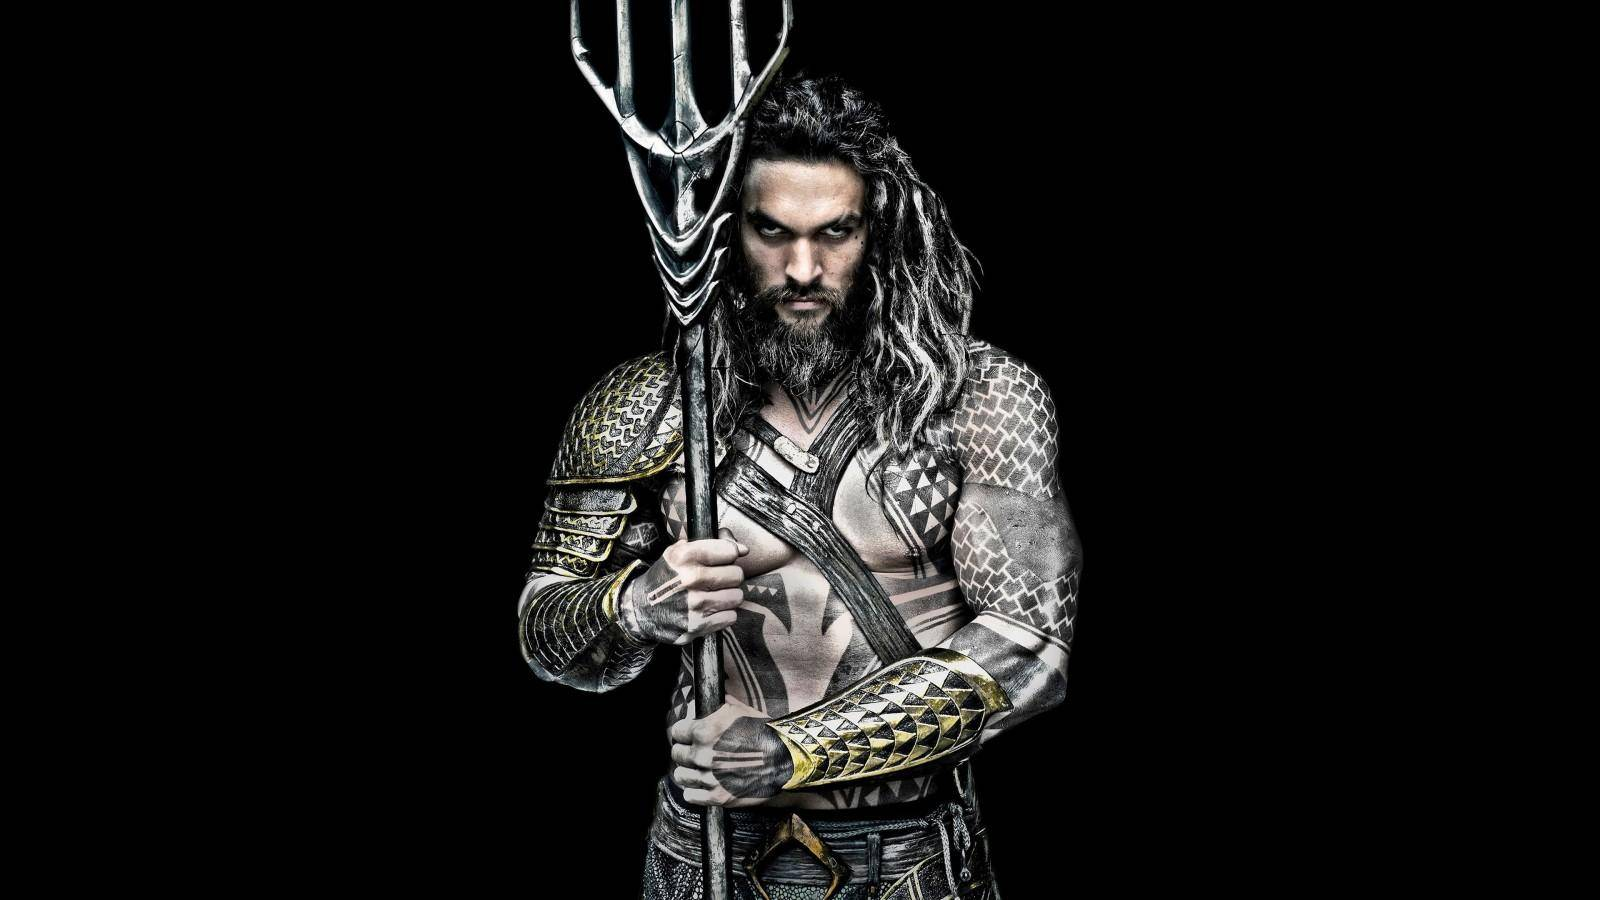 Aquaman, Jason Momoa, Justice League, Snyder Cut